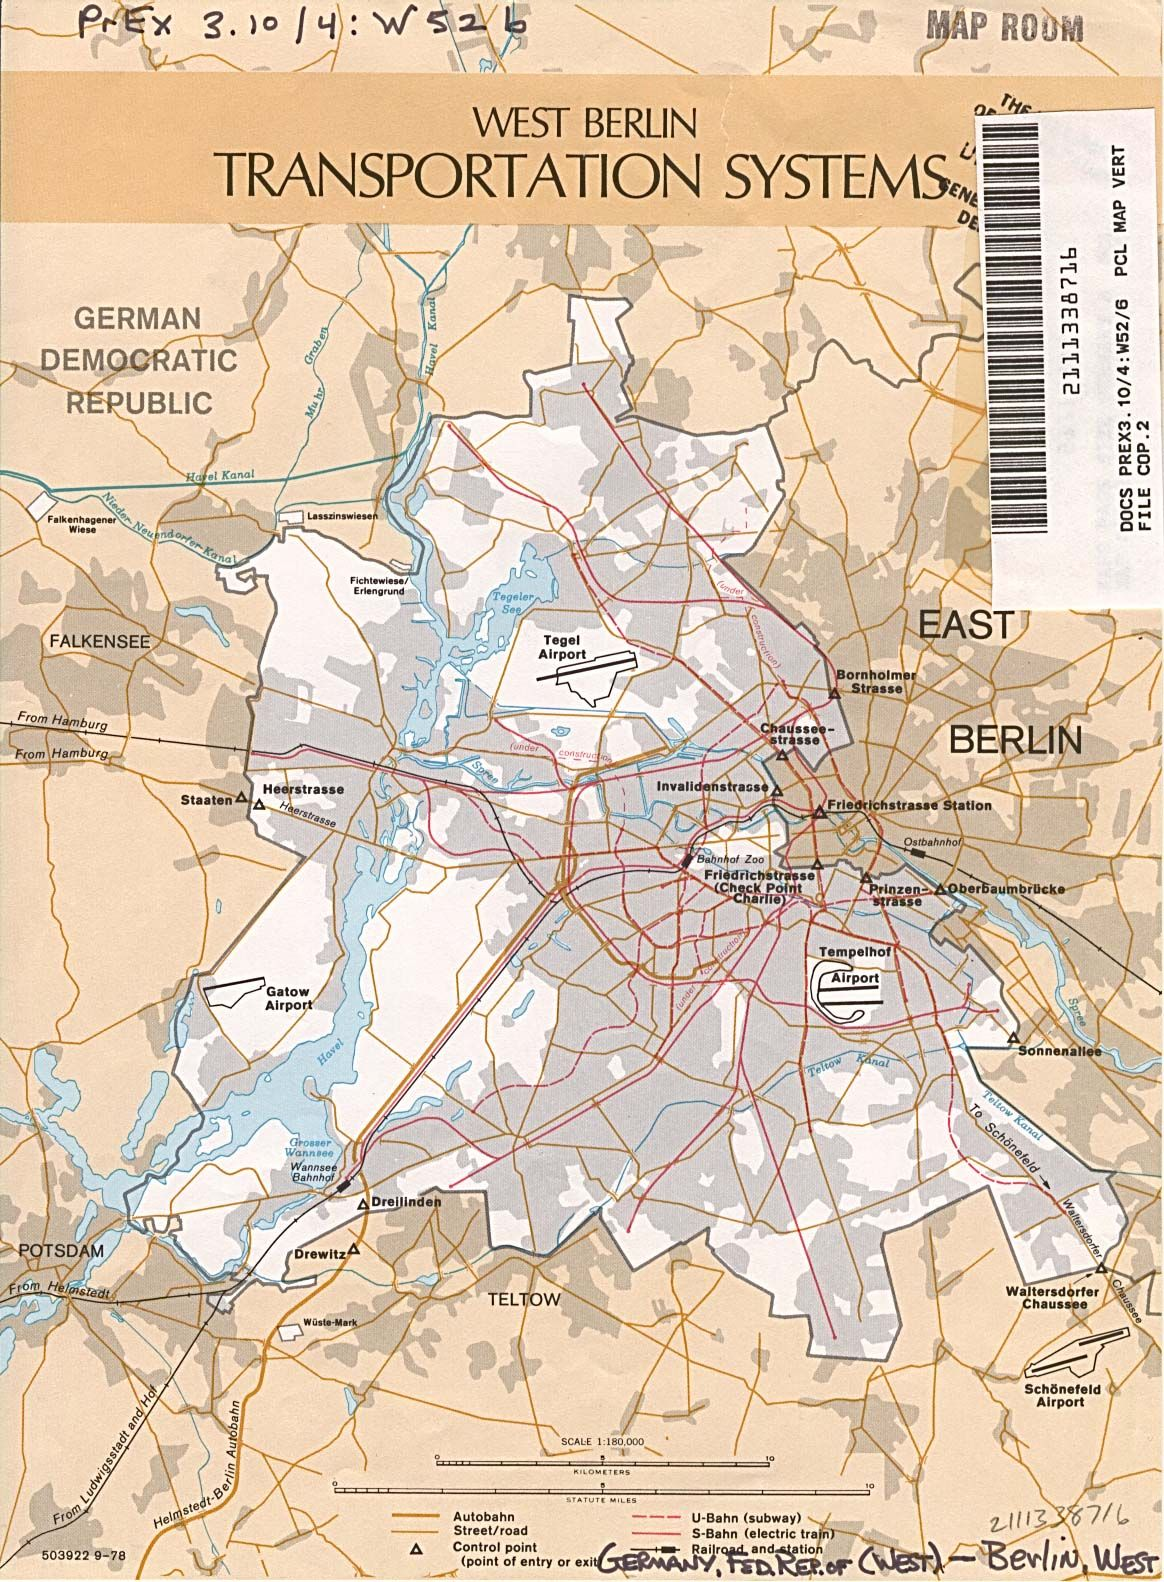 Berlin Wall Subway Map.West Berlin Transport 1978 Maps West Berlin Berlin Berlin Wall